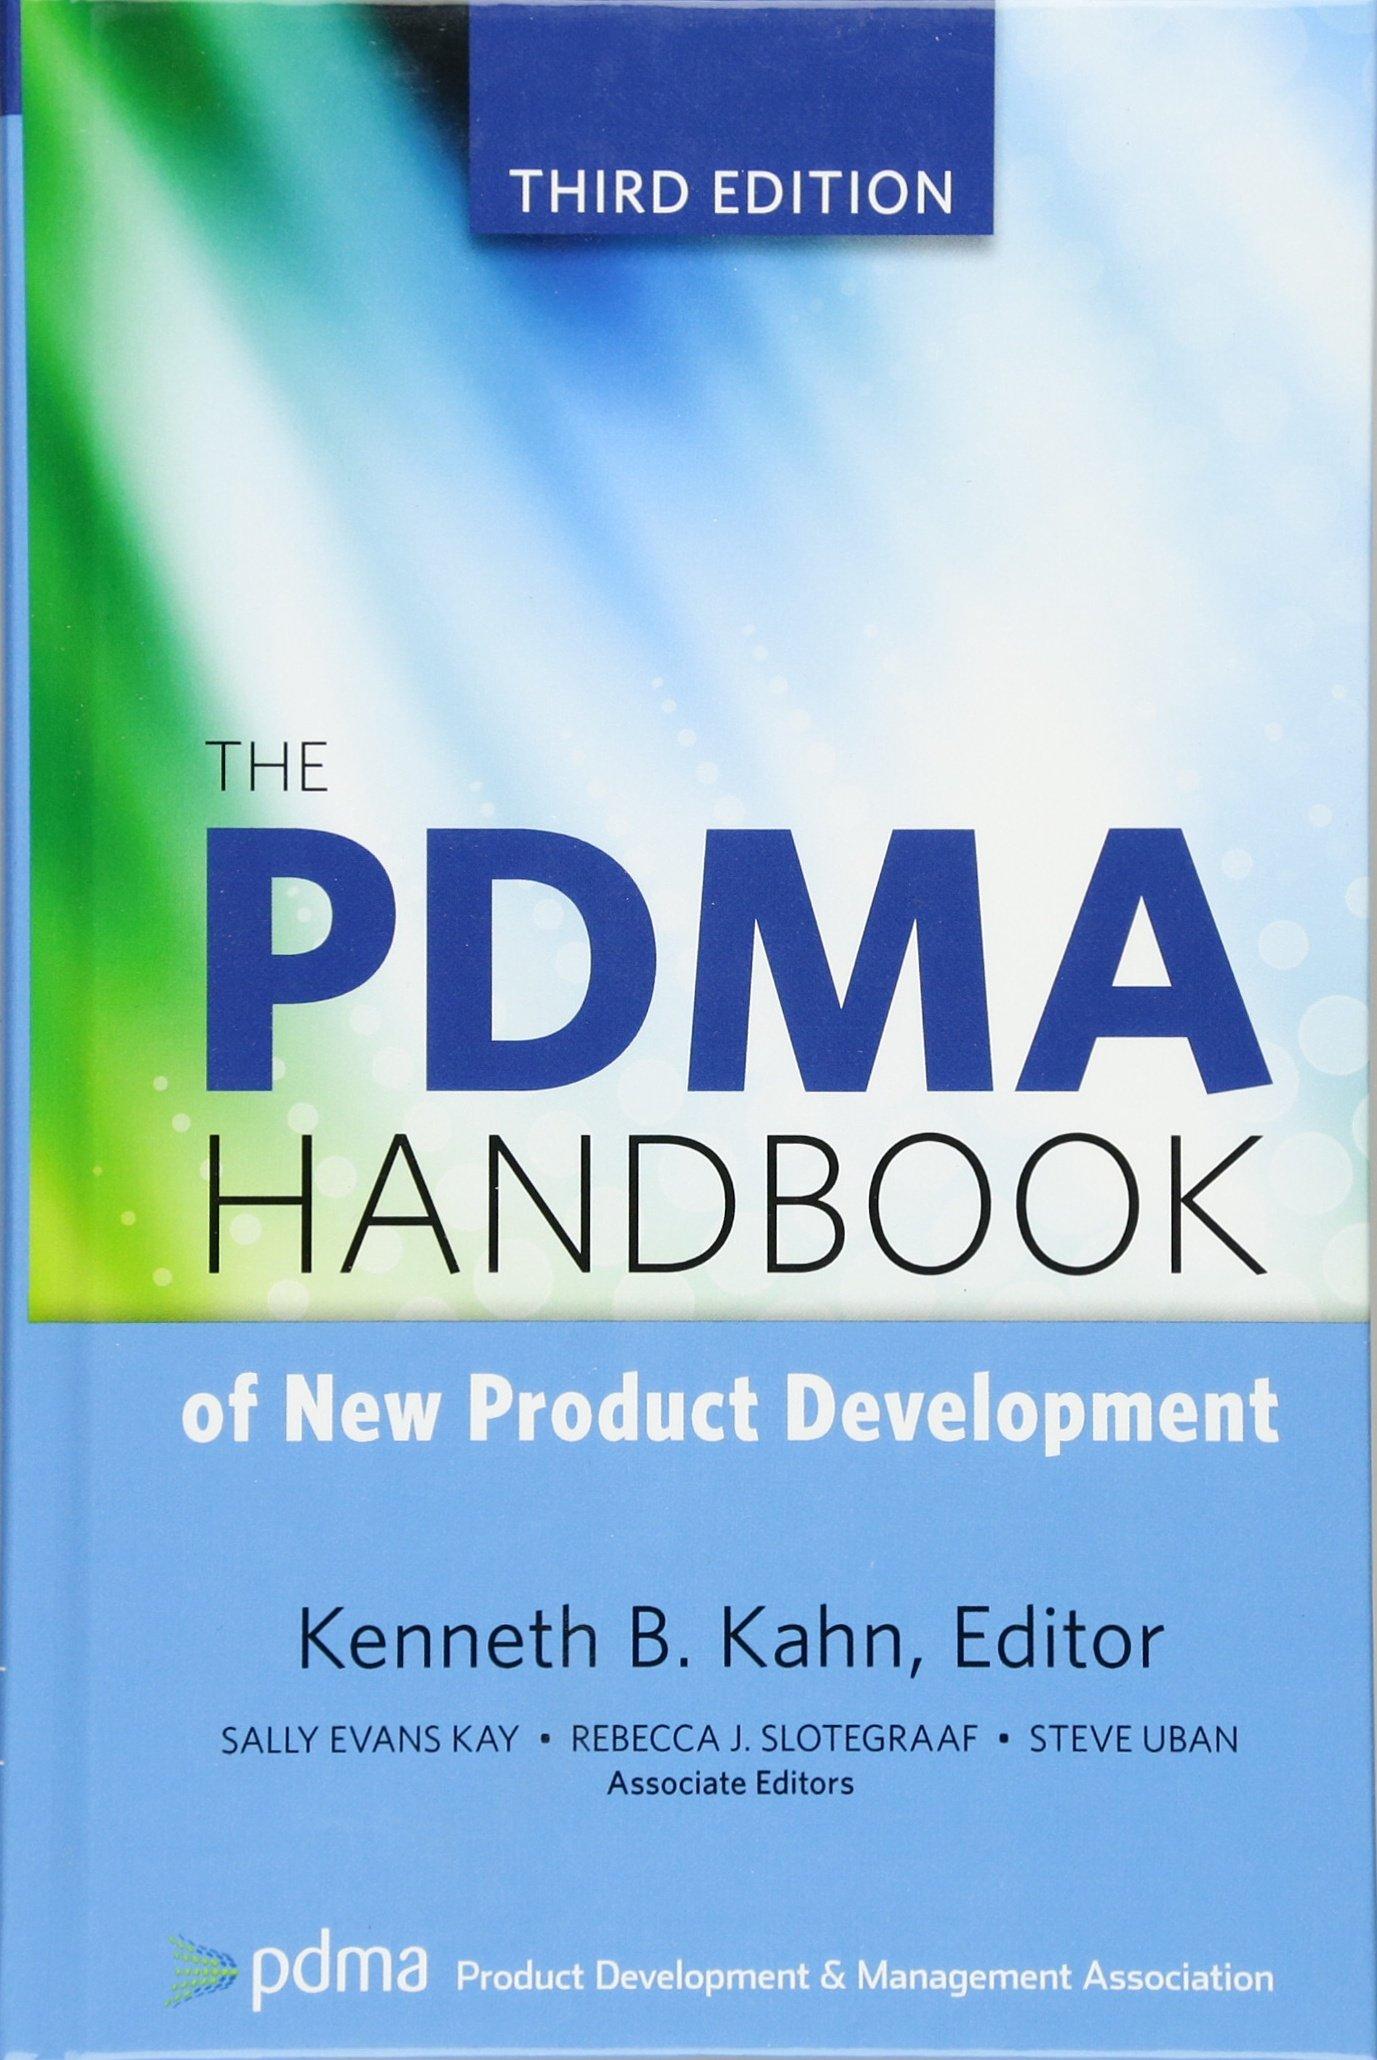 The PDMA Handbook of New Product Development: 9780470648209: Business  Development Books @ Amazon.com